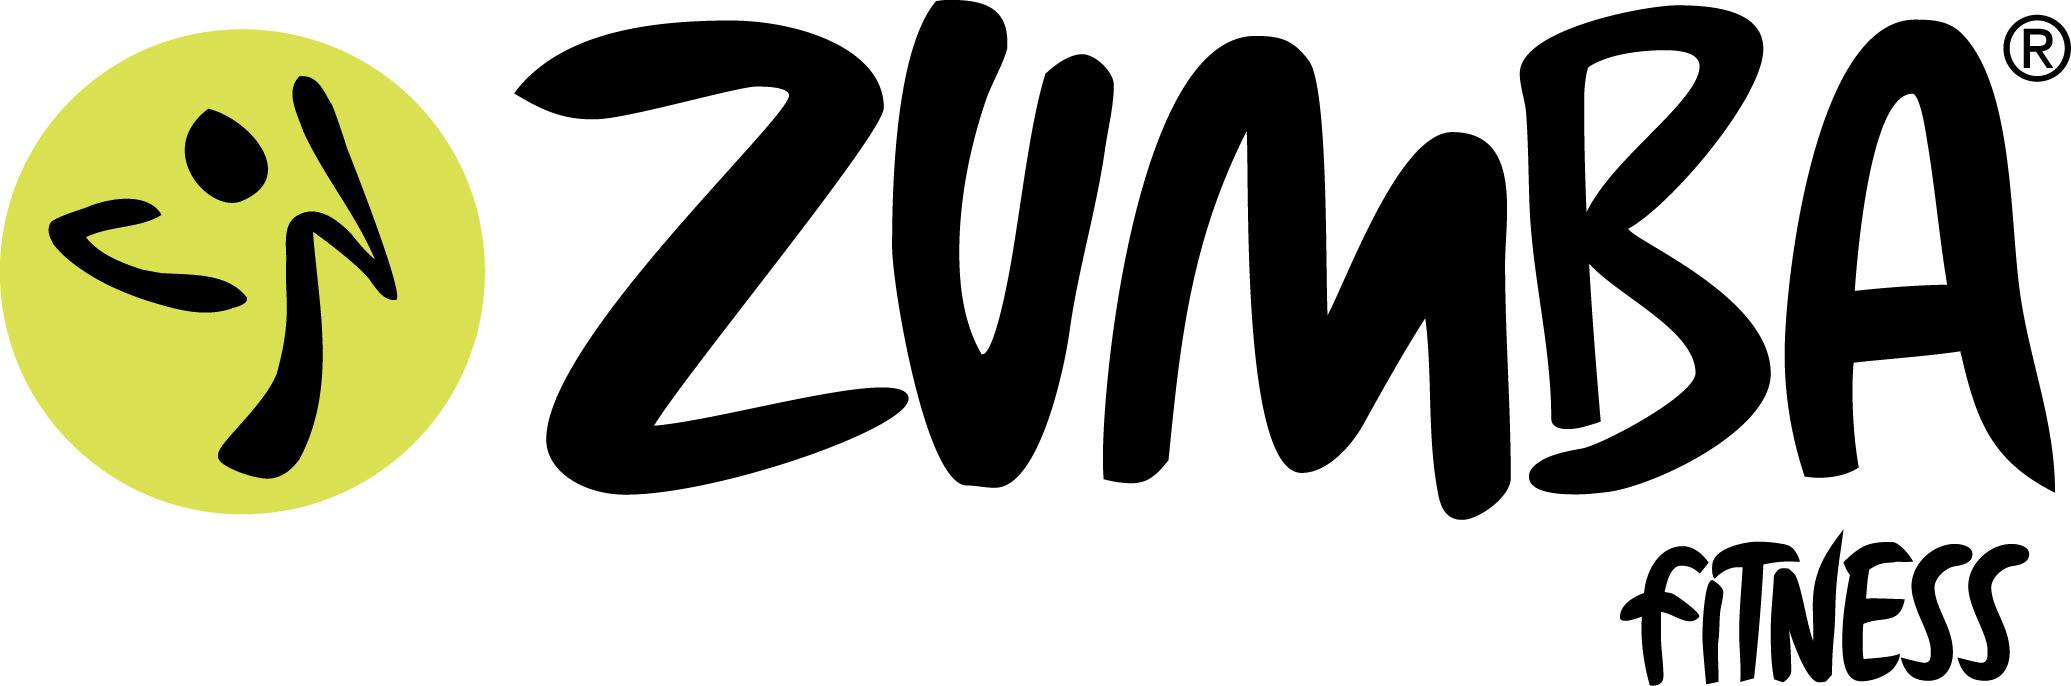 Zumba logo clipart clipartfest 3